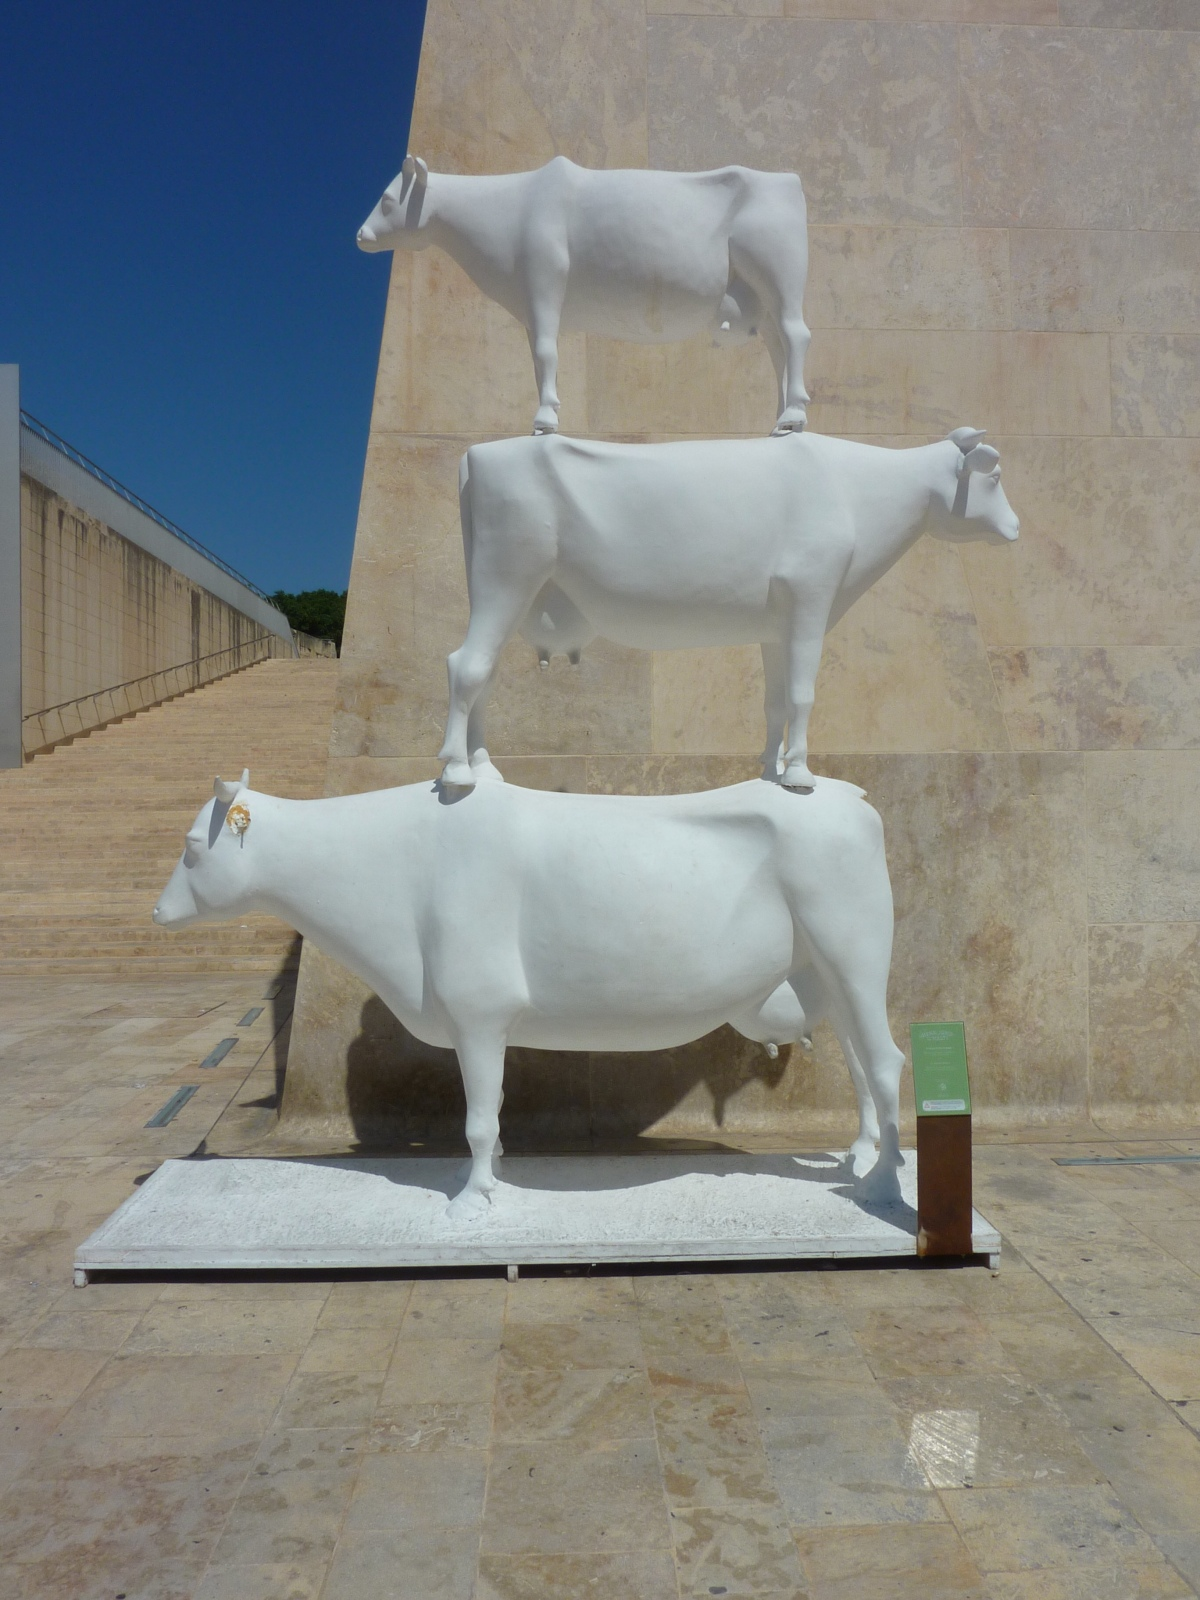 Art installation celebrating Malteseproverbs